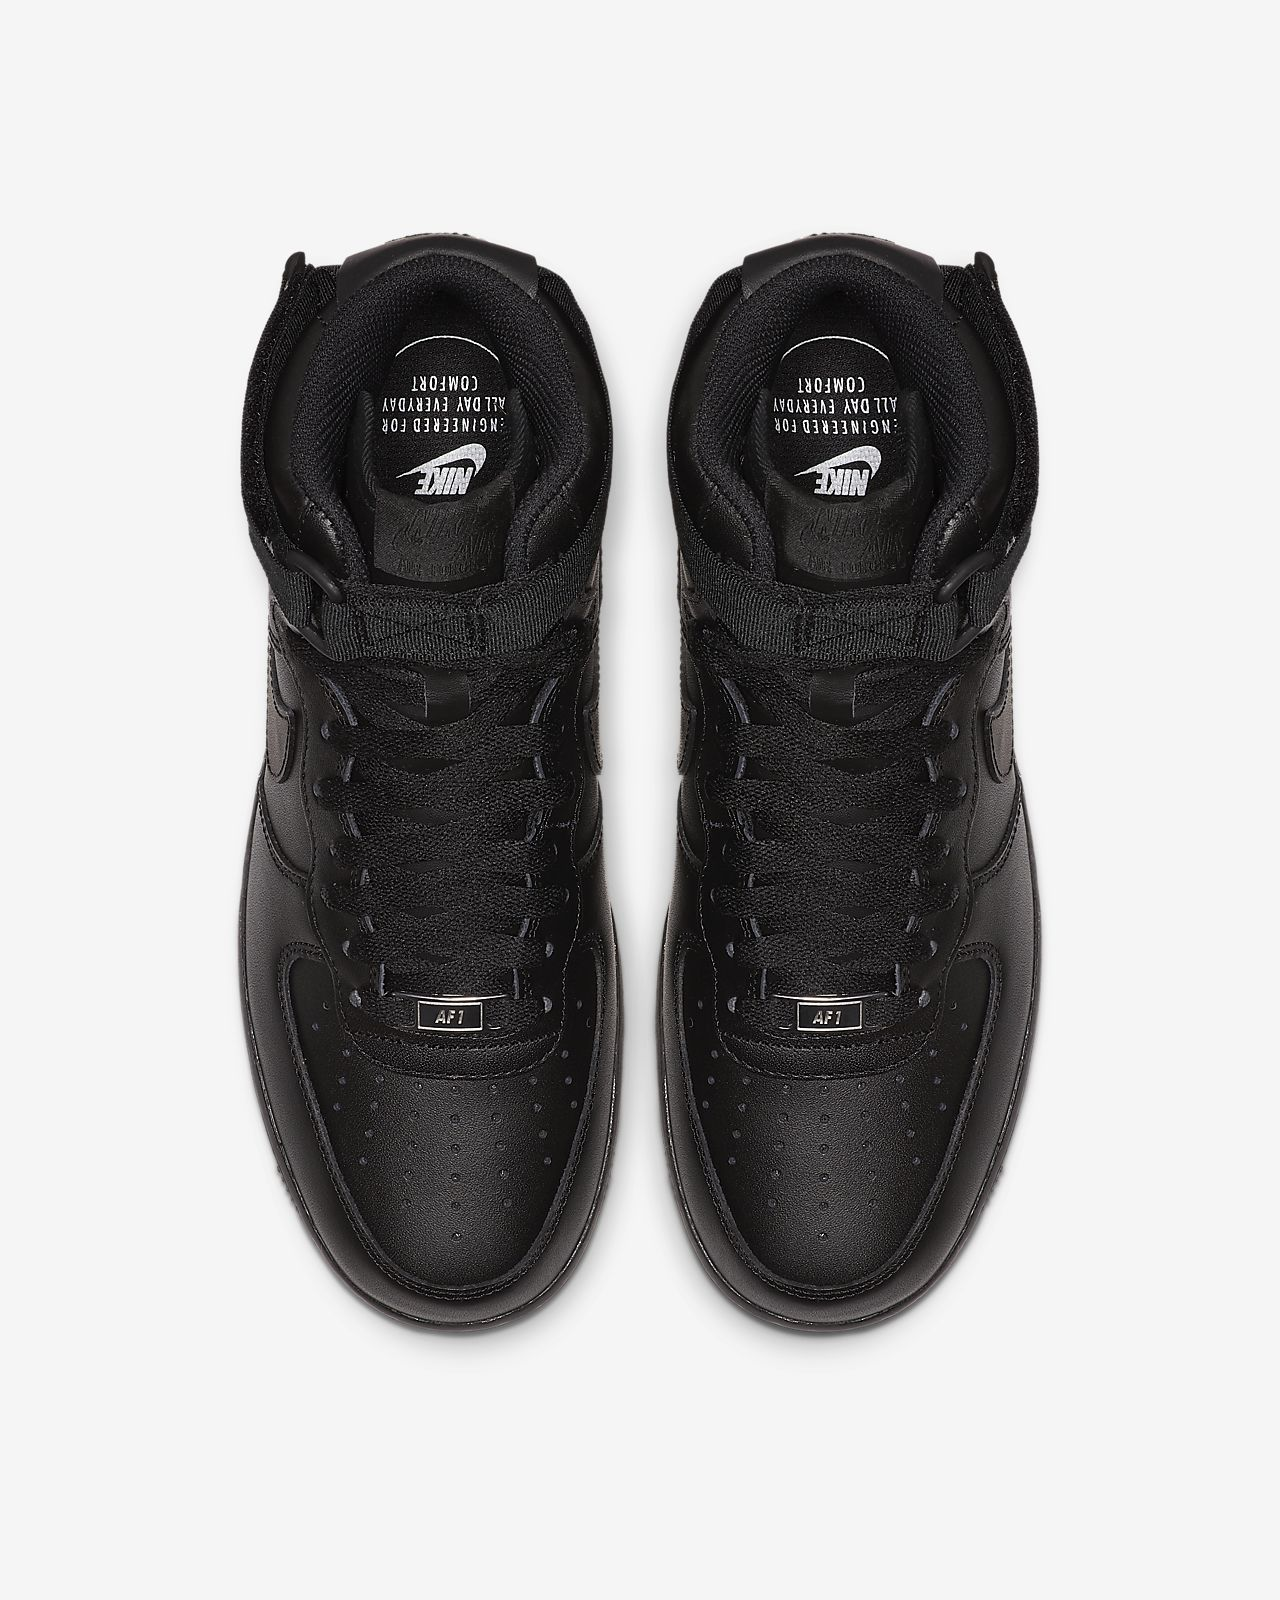 Chaussure Nike Air Force 1 High 08 LE pour Femme